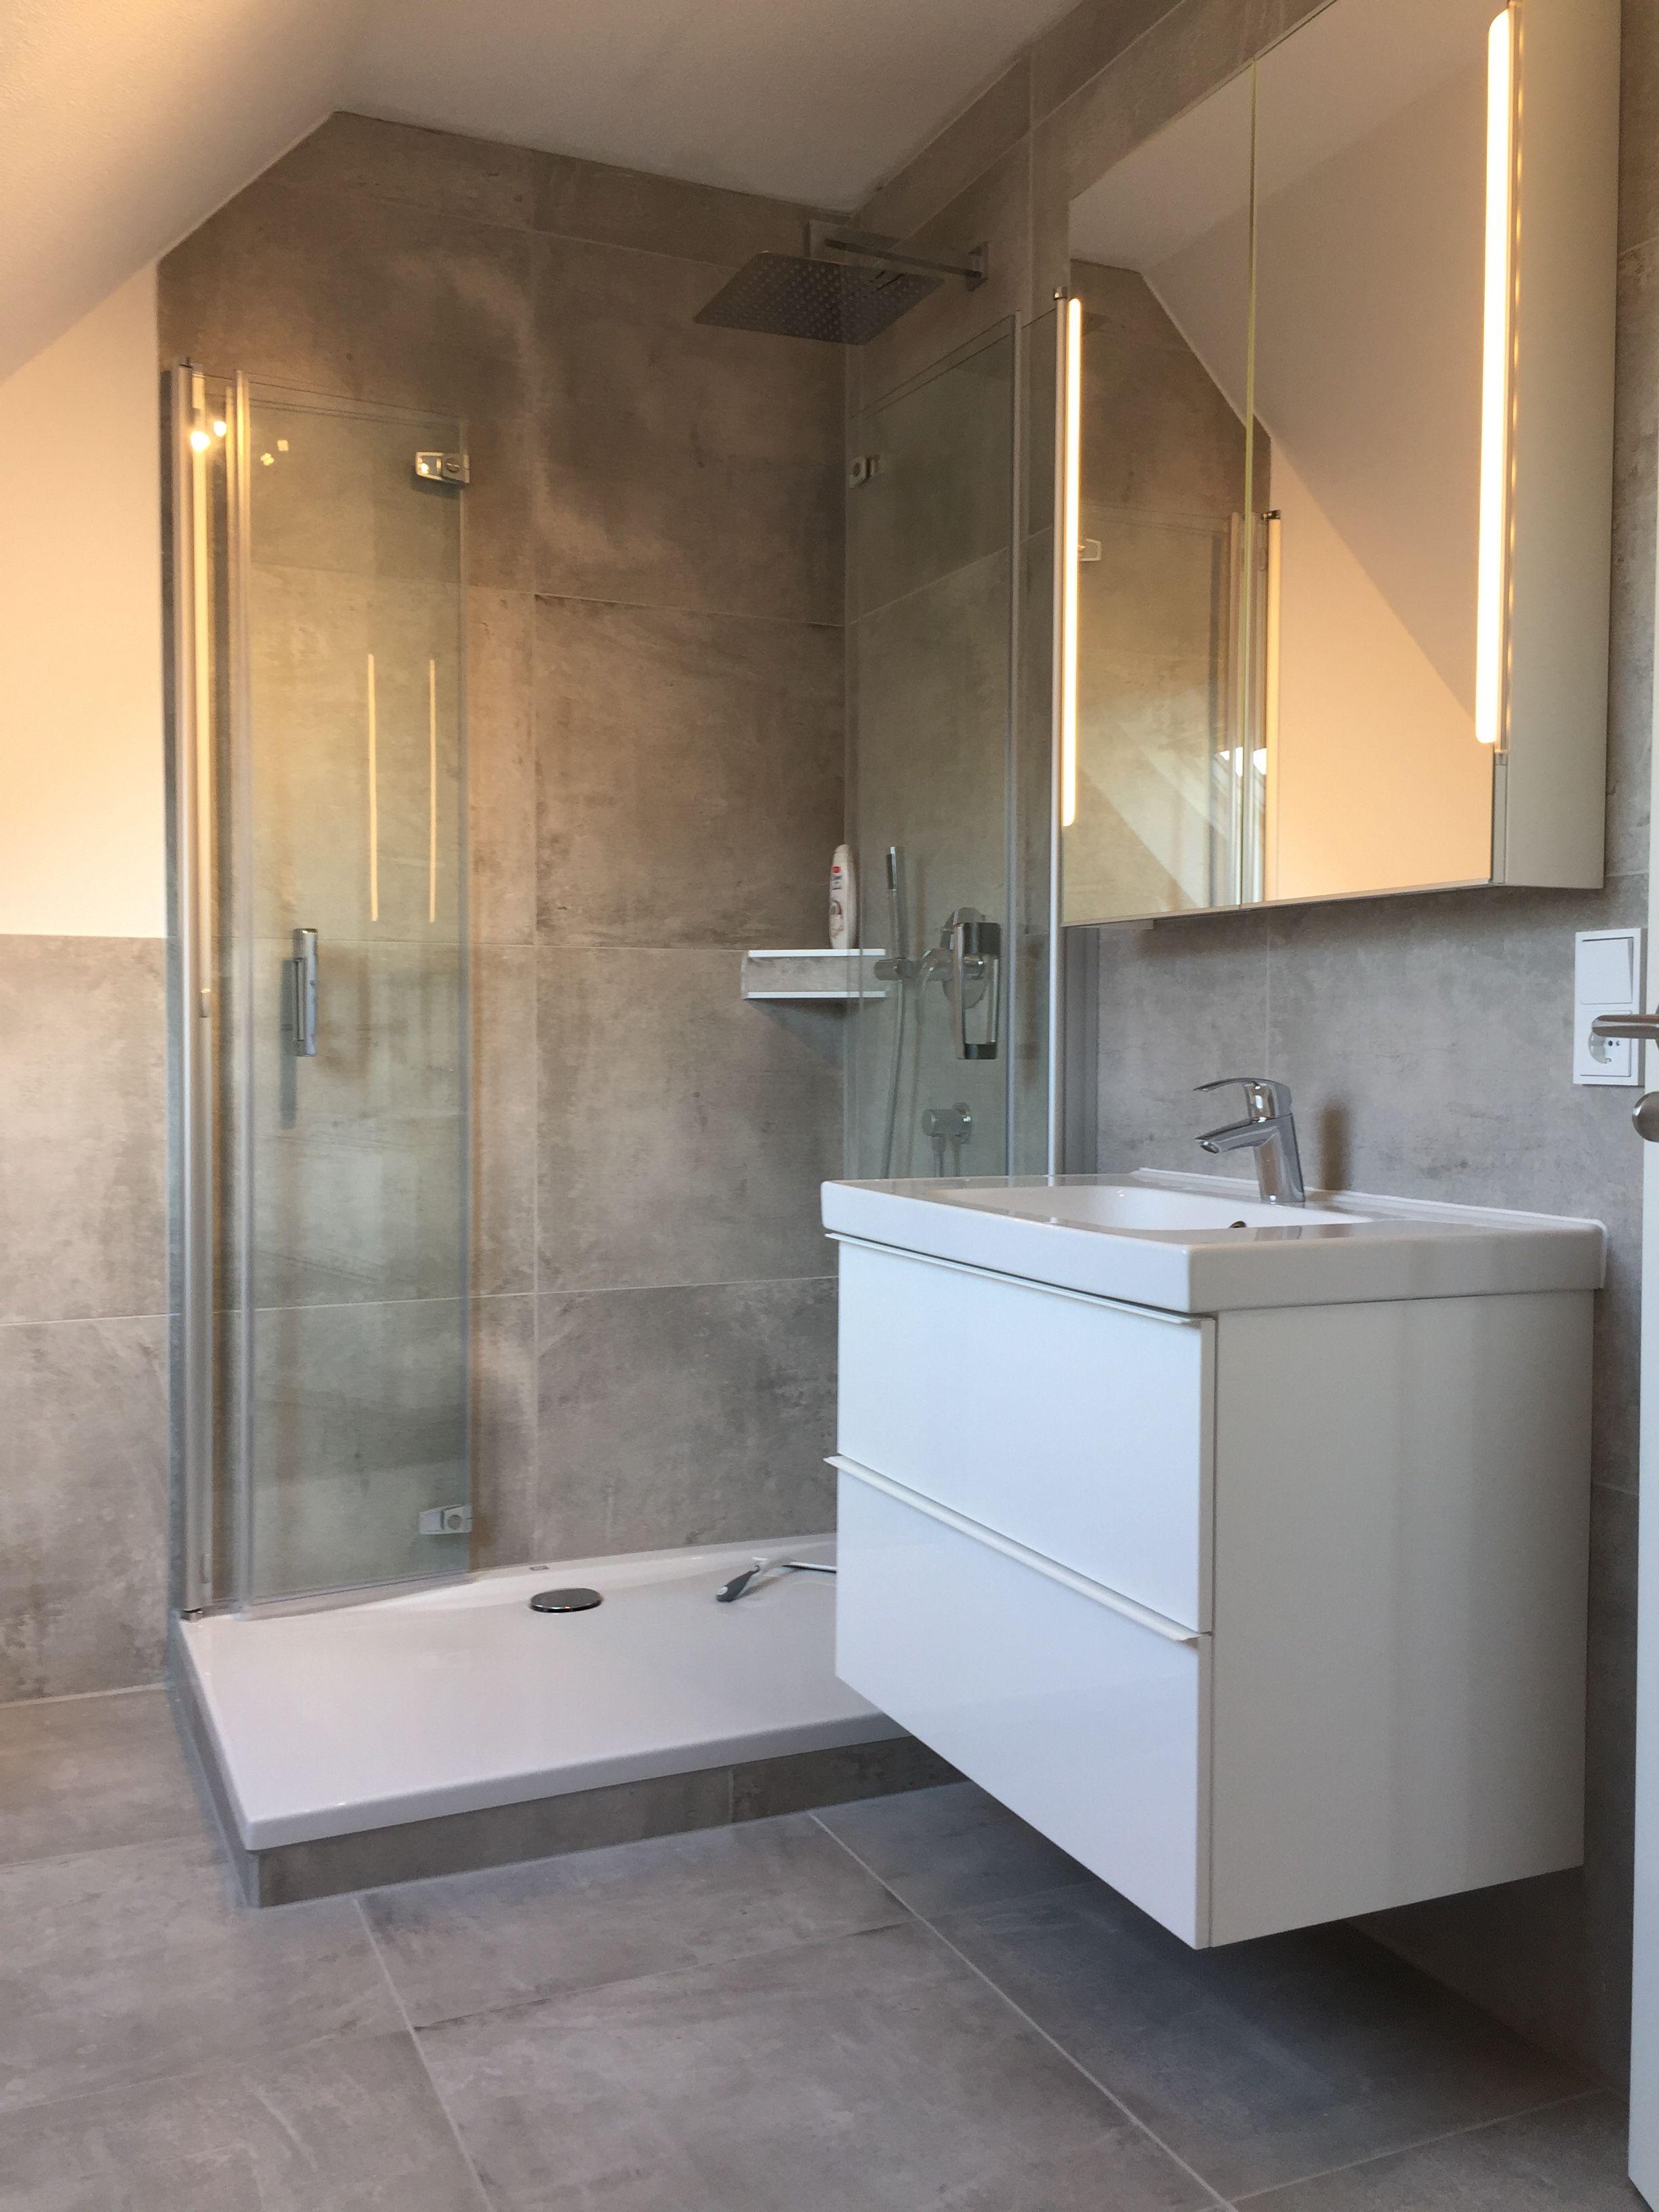 ikea badmöbel rf duschwanne grohe armaturen betonoptik